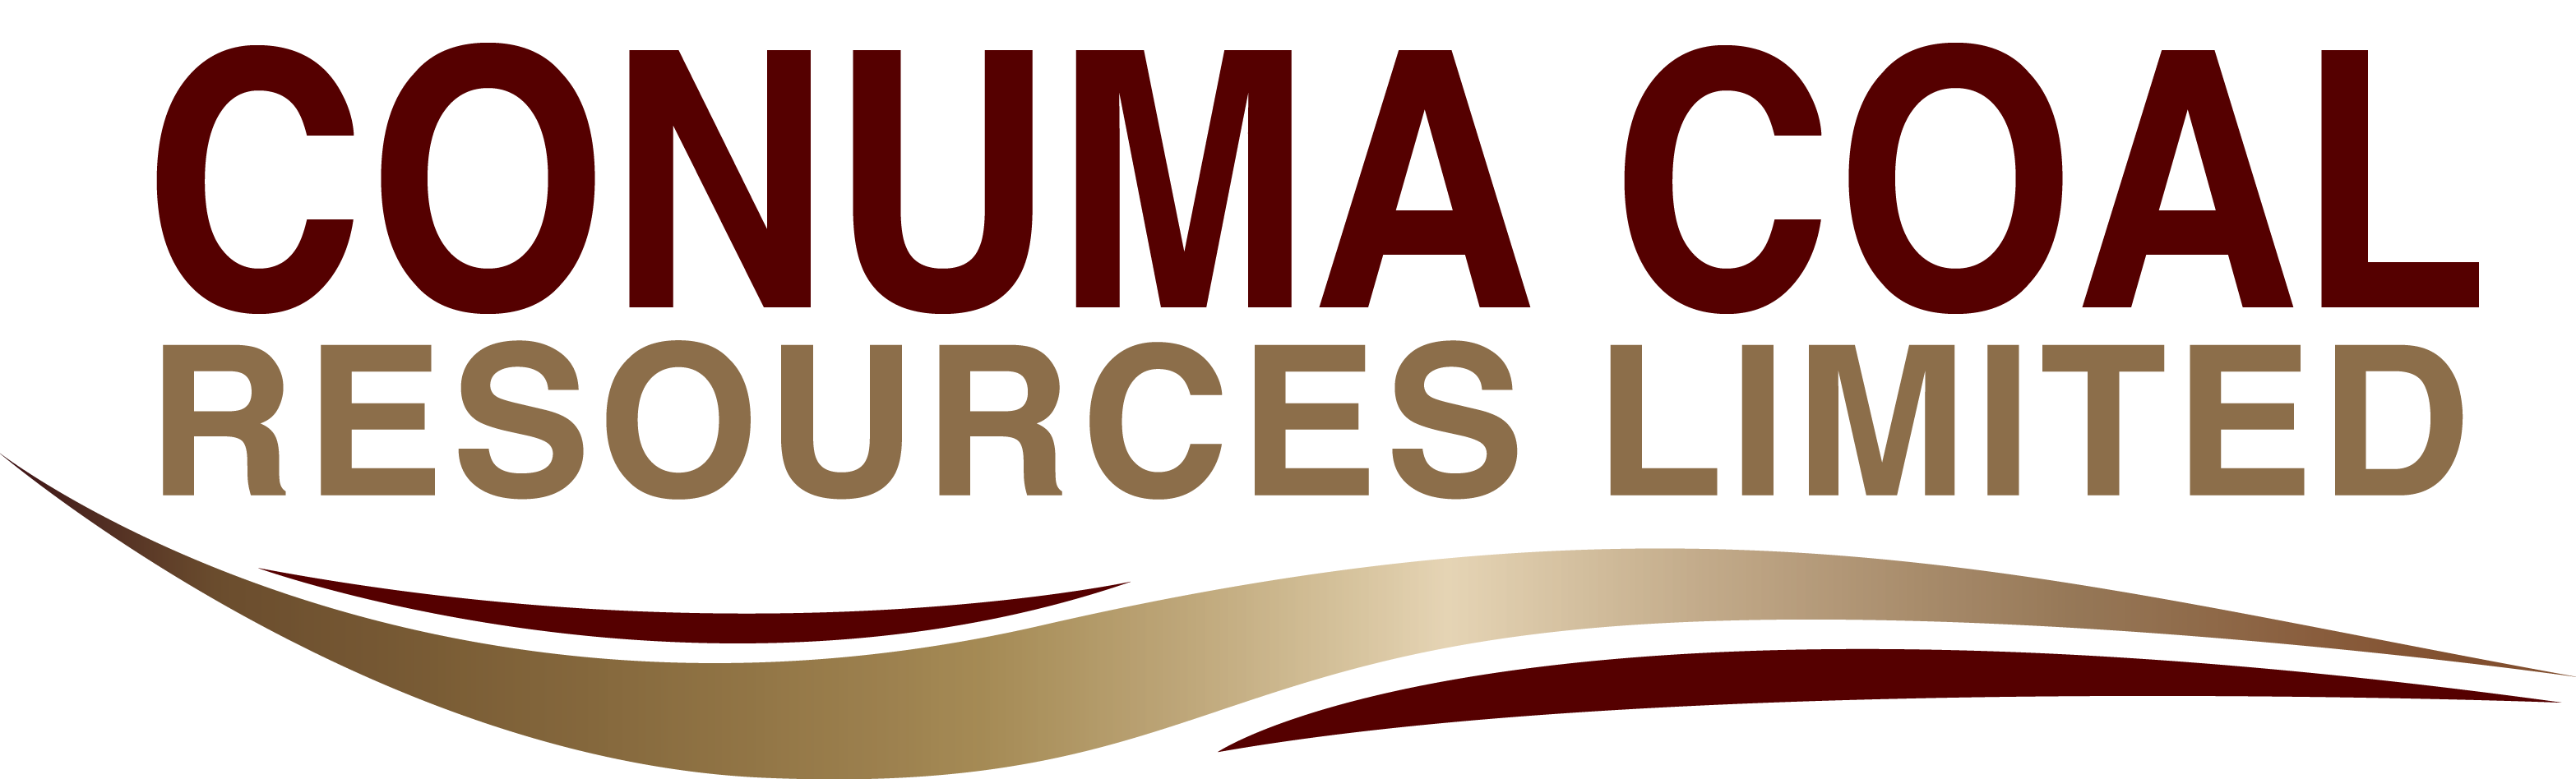 Conuma Coal Resources